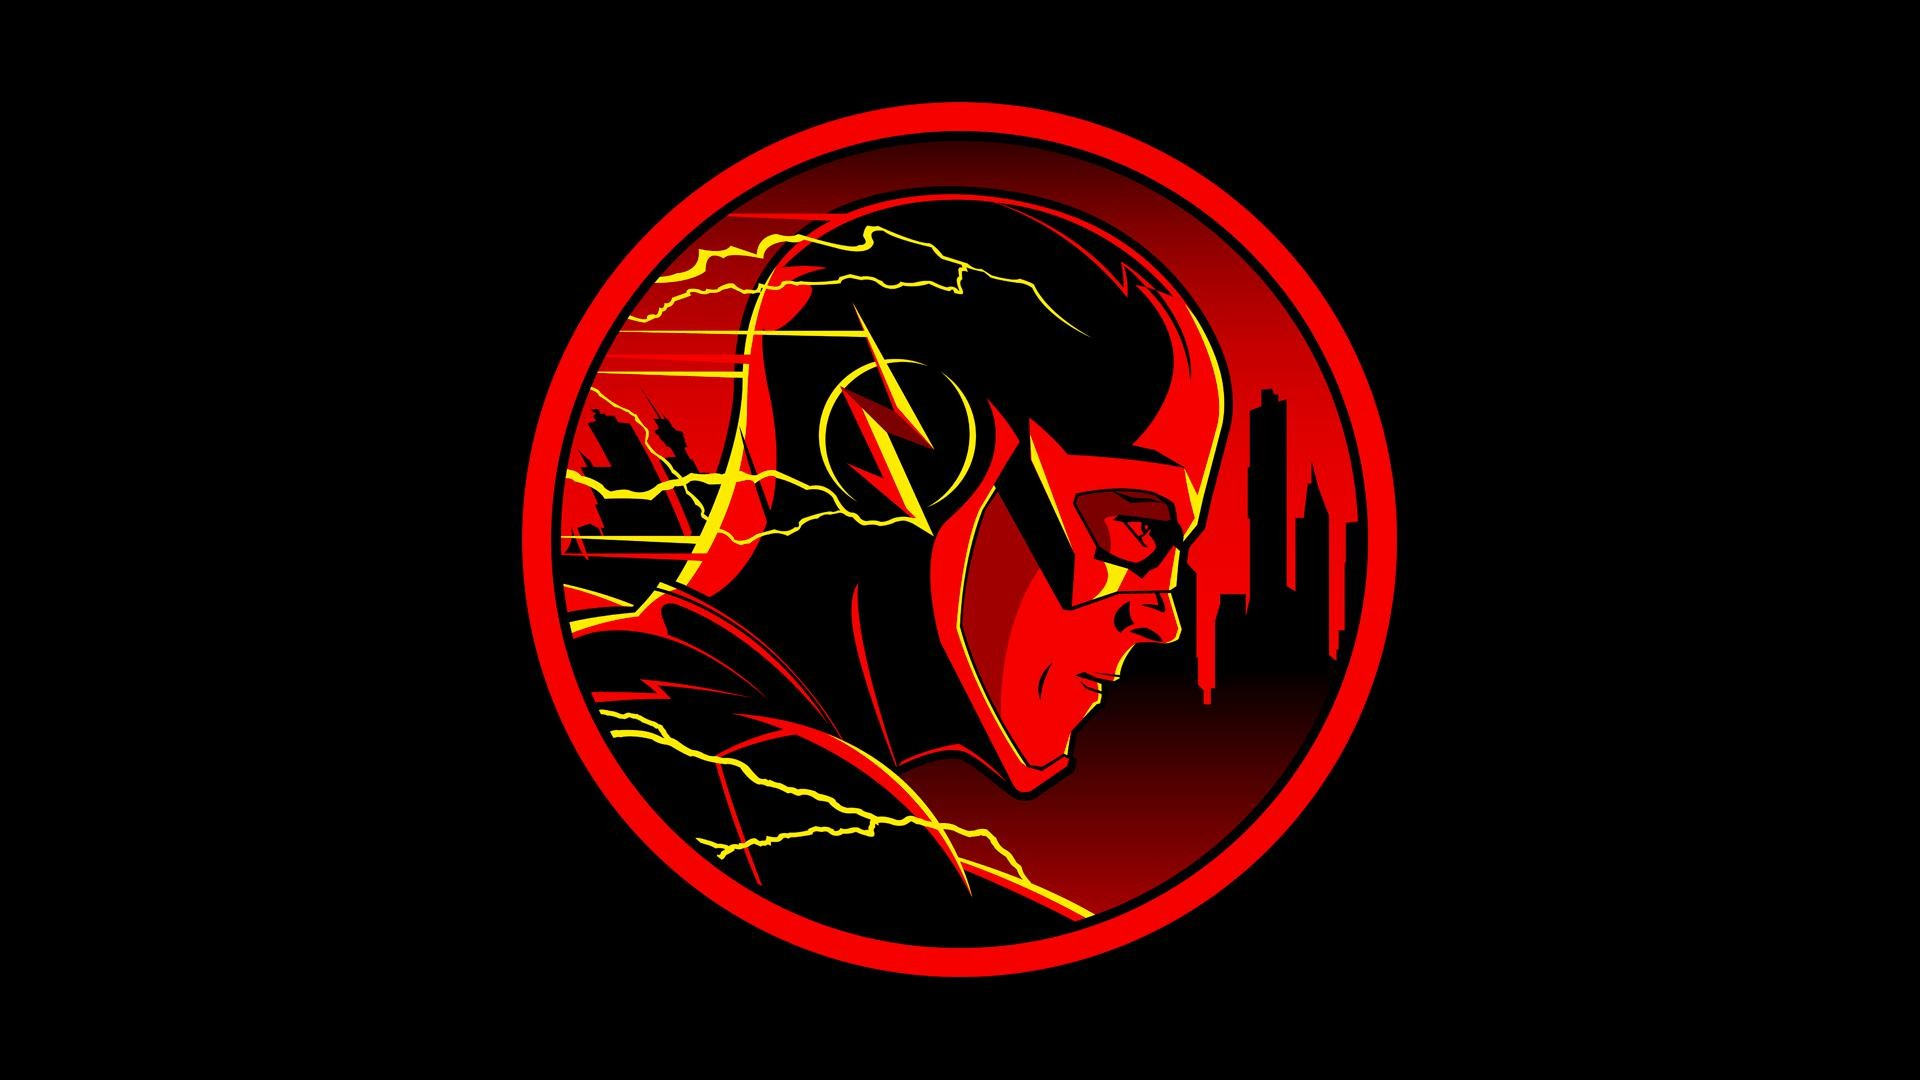 … The Flash Logo Desktop Wallpaper … cw logo wallpaper superhero  crossover – photo #33 .